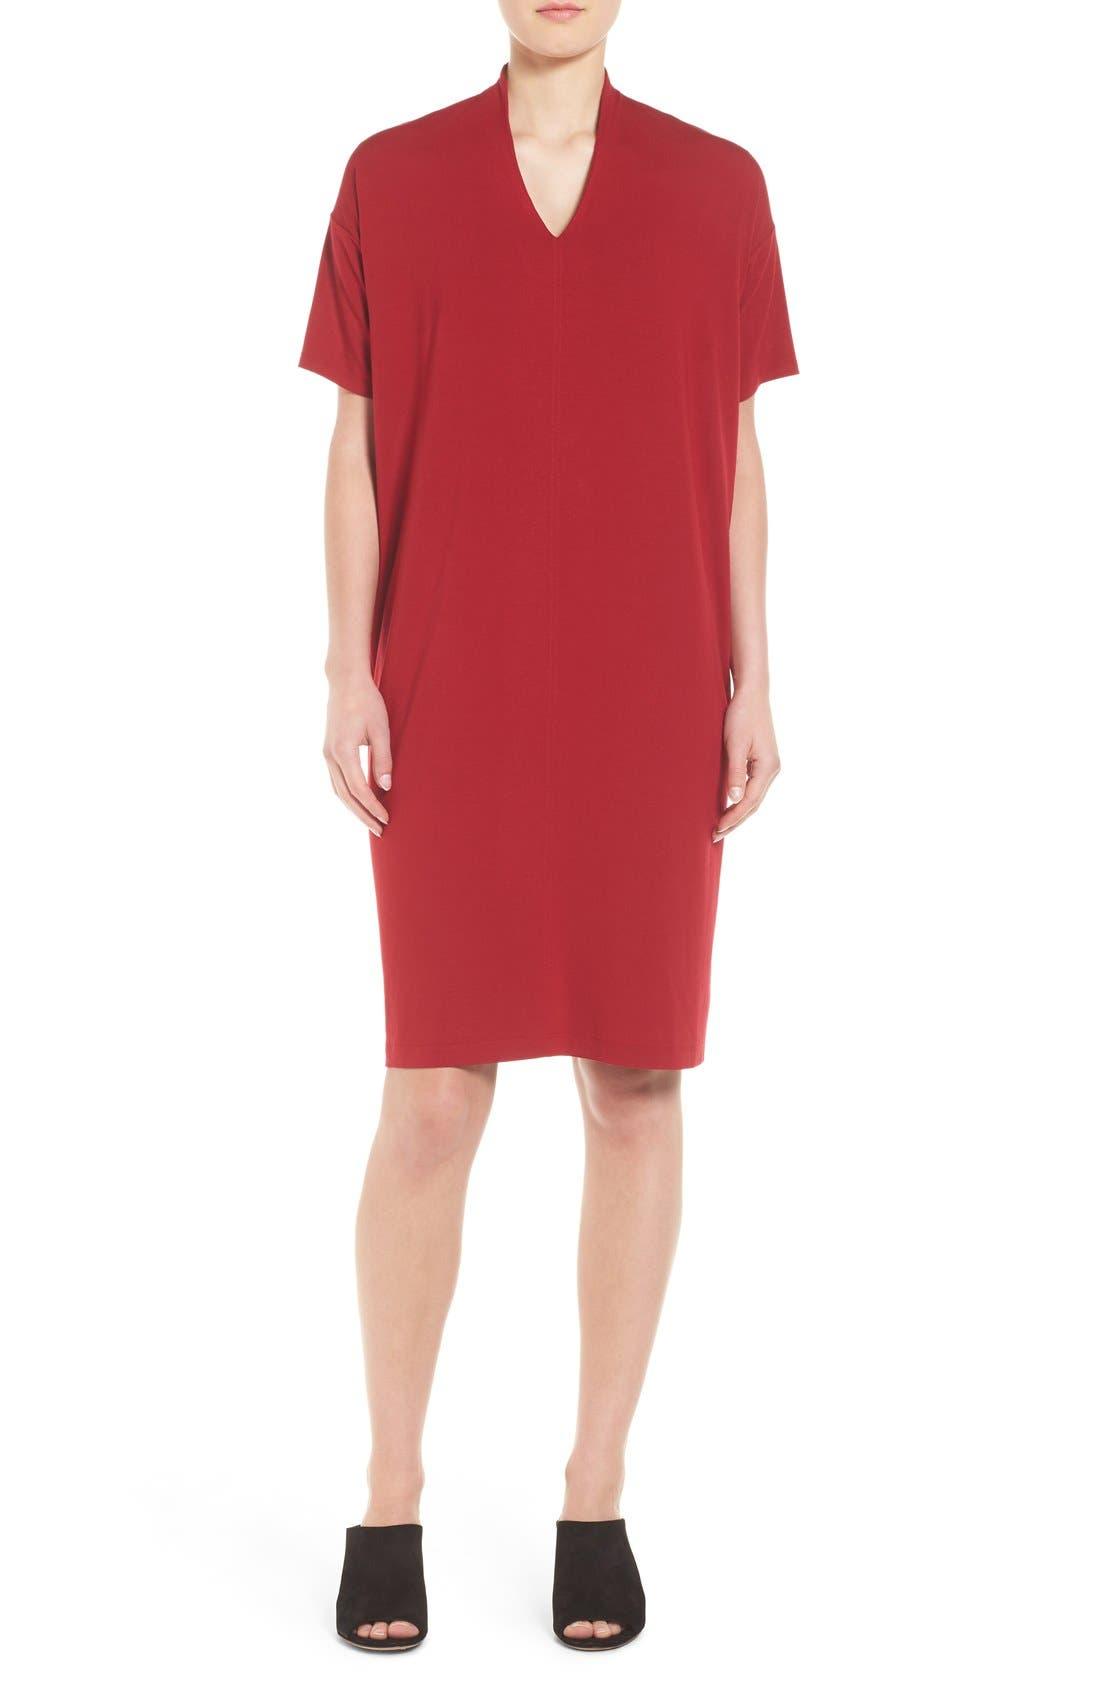 Alternate Image 1 Selected - Eileen Fisher V-Neck Stretch Jersey Shift Dress